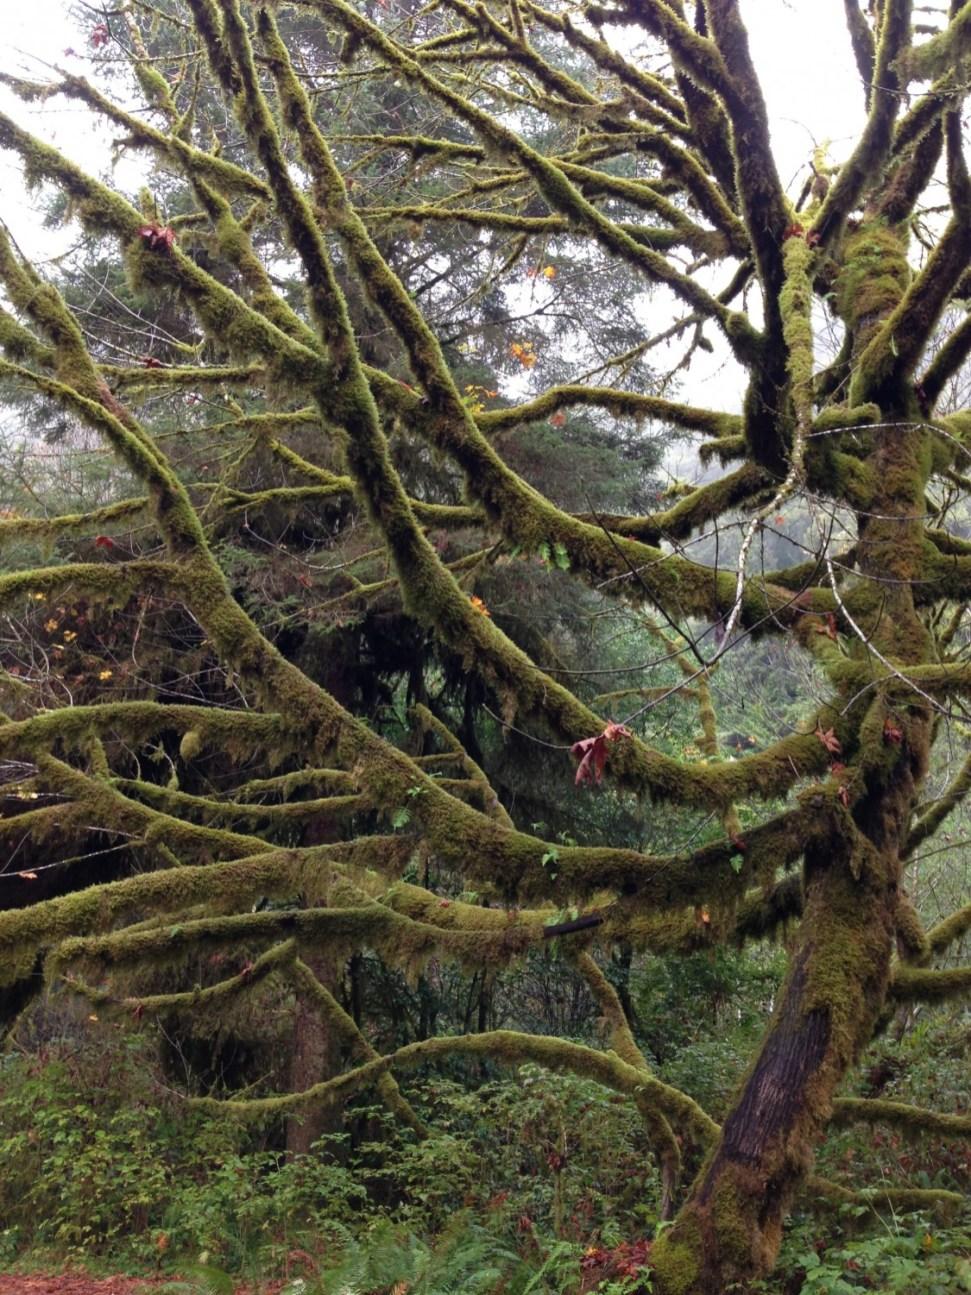 Furry tree